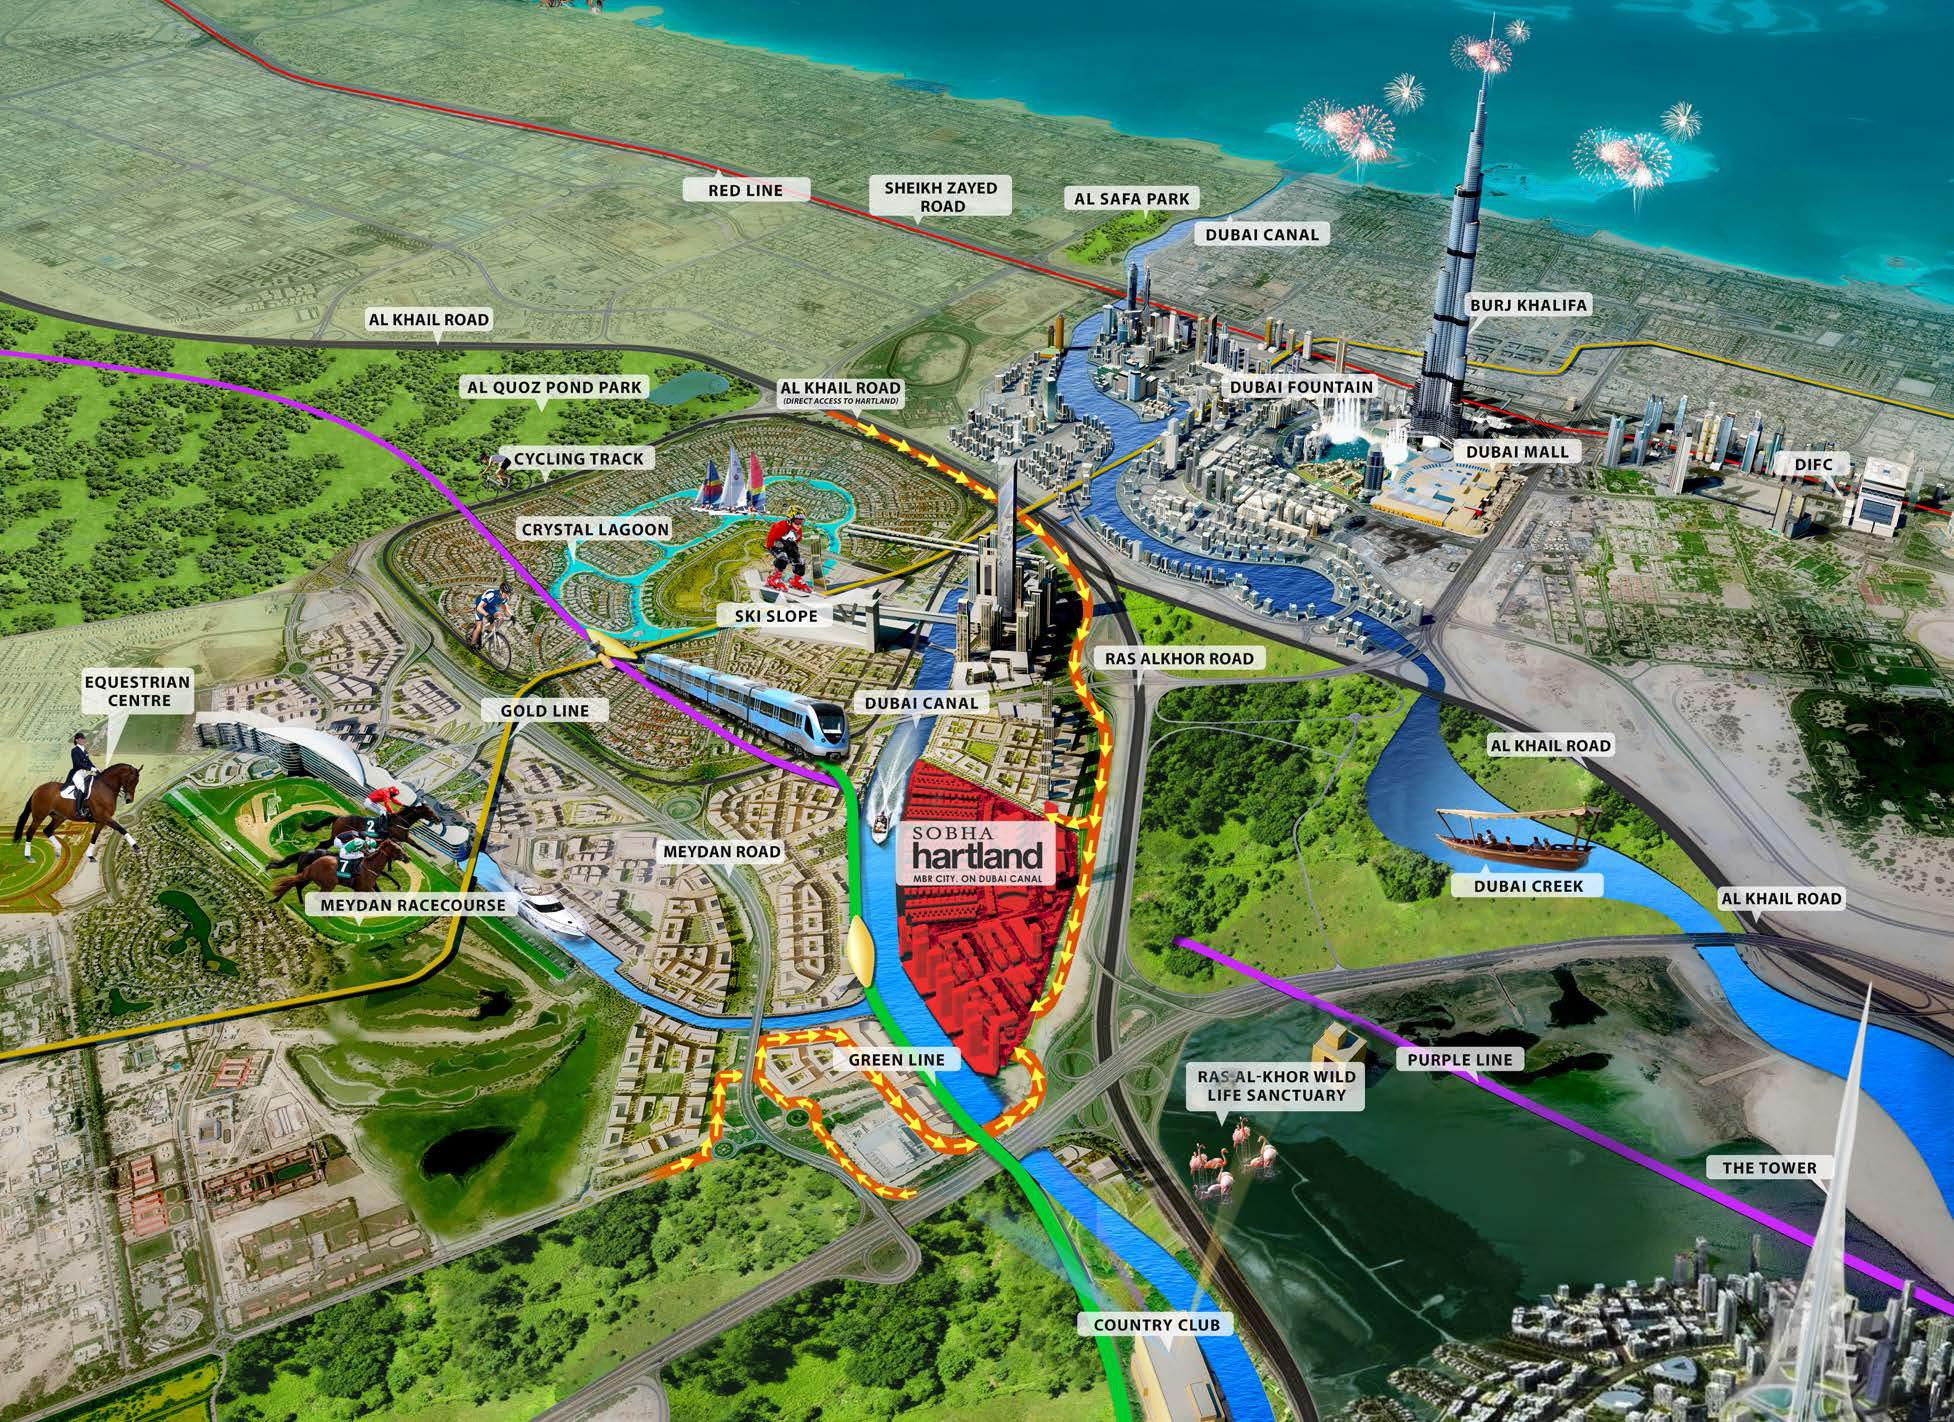 Hartland-Aflux Master Plan